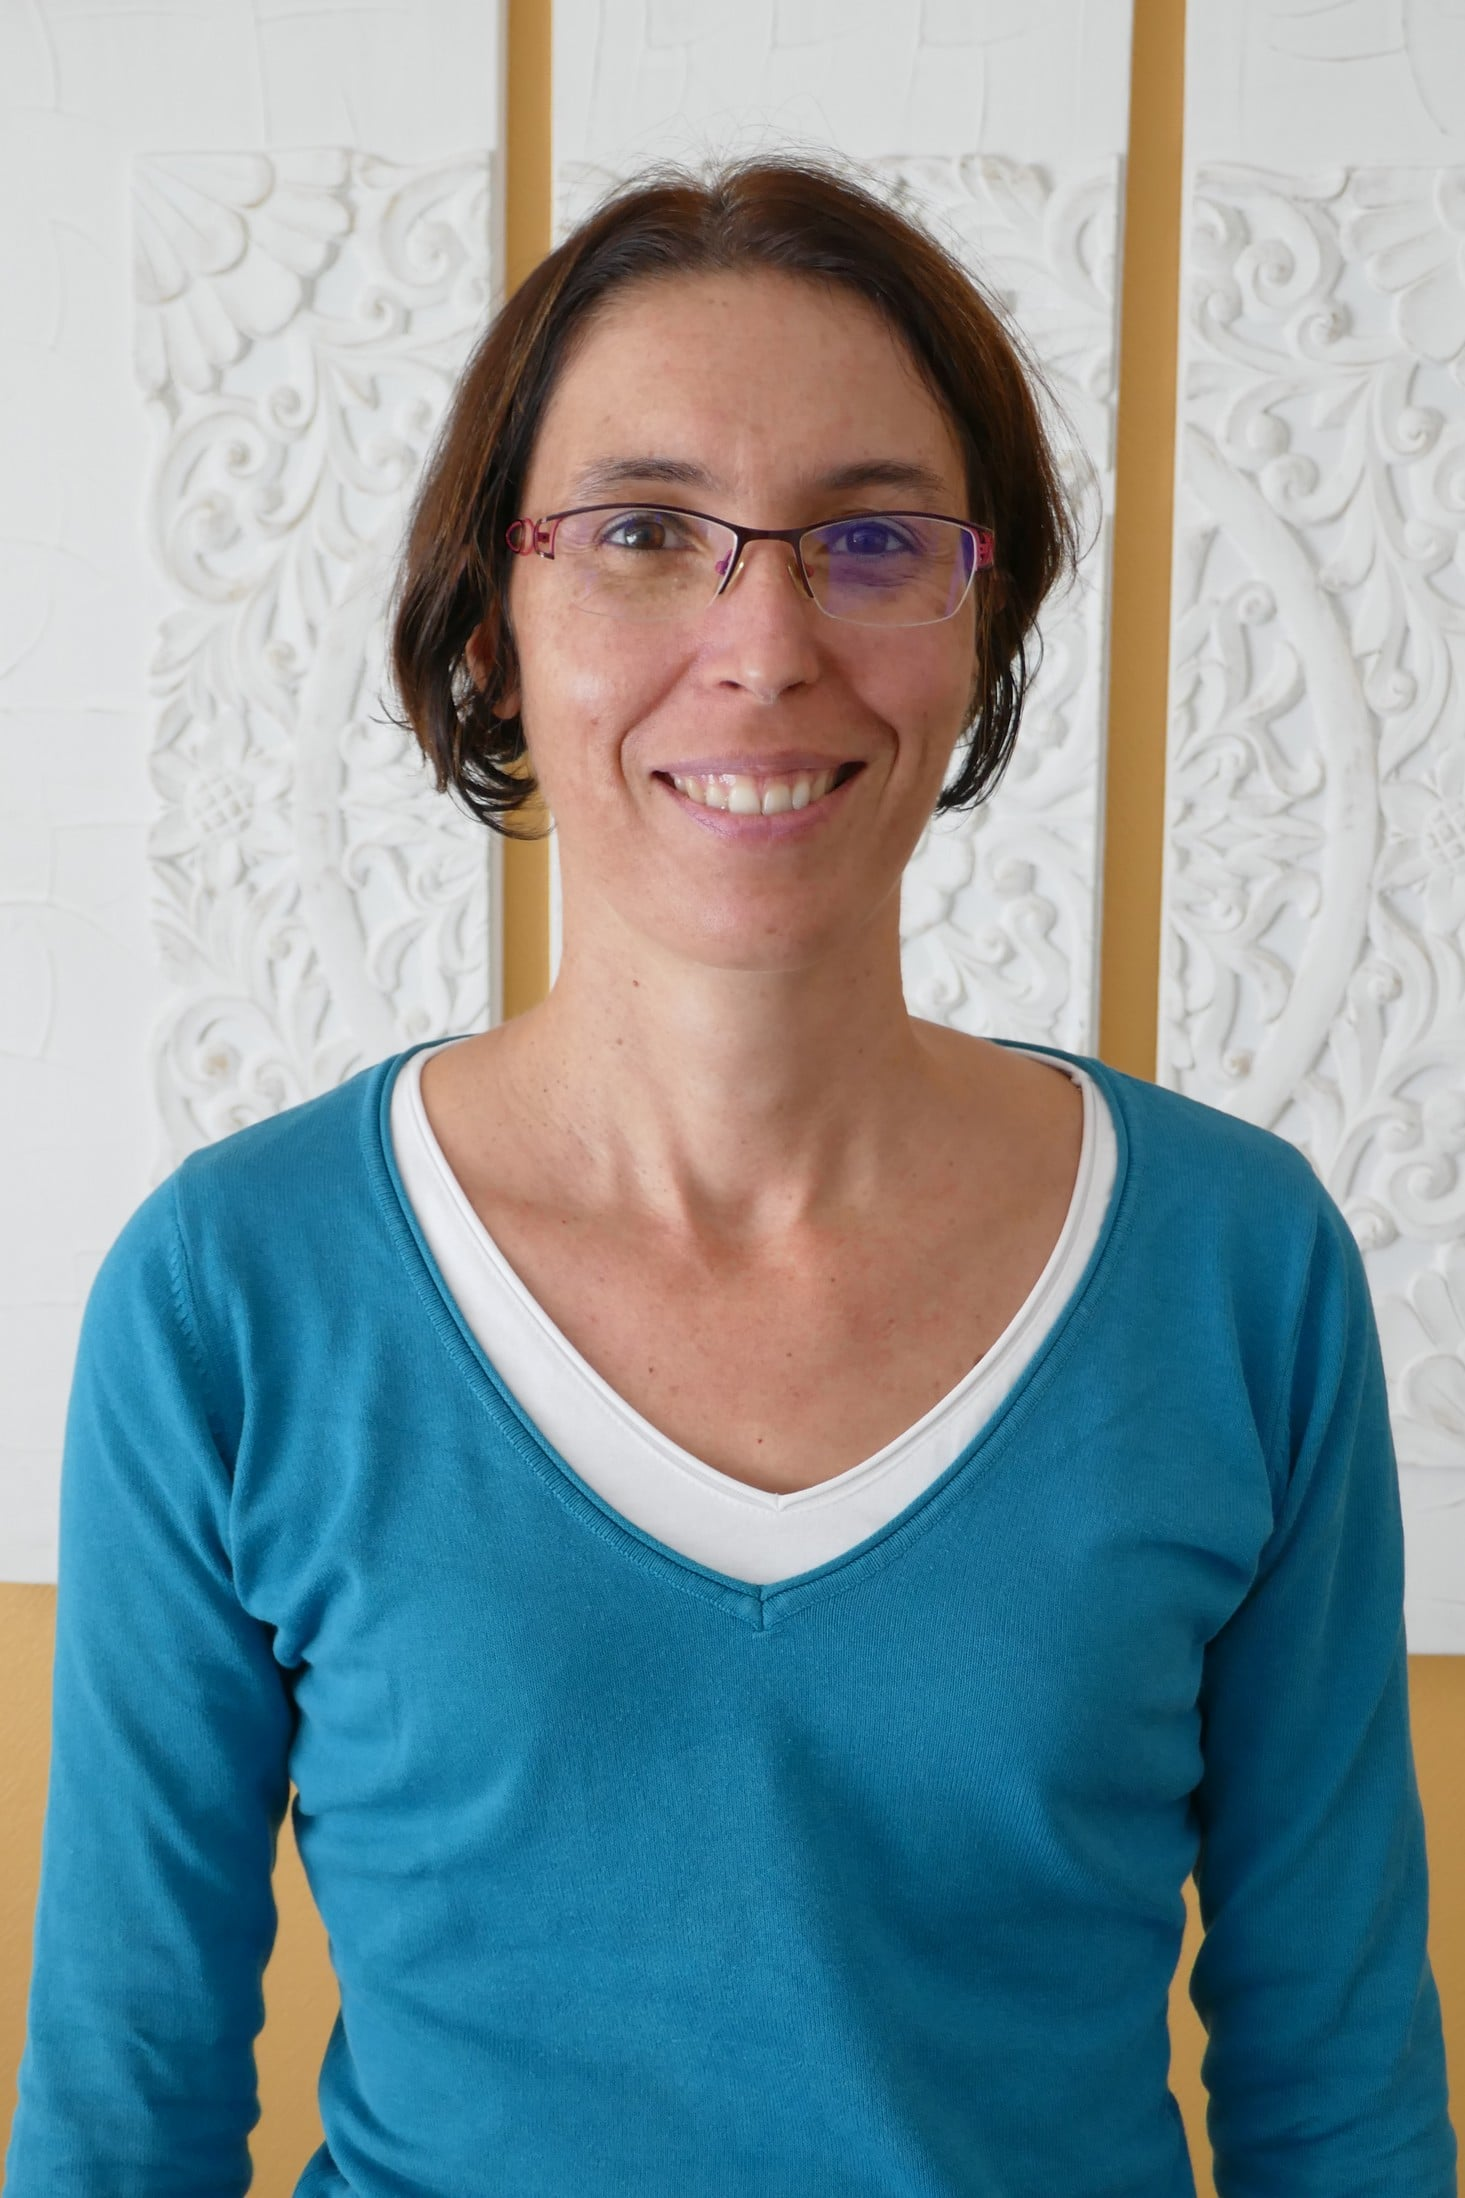 Stephanie Bonhomme